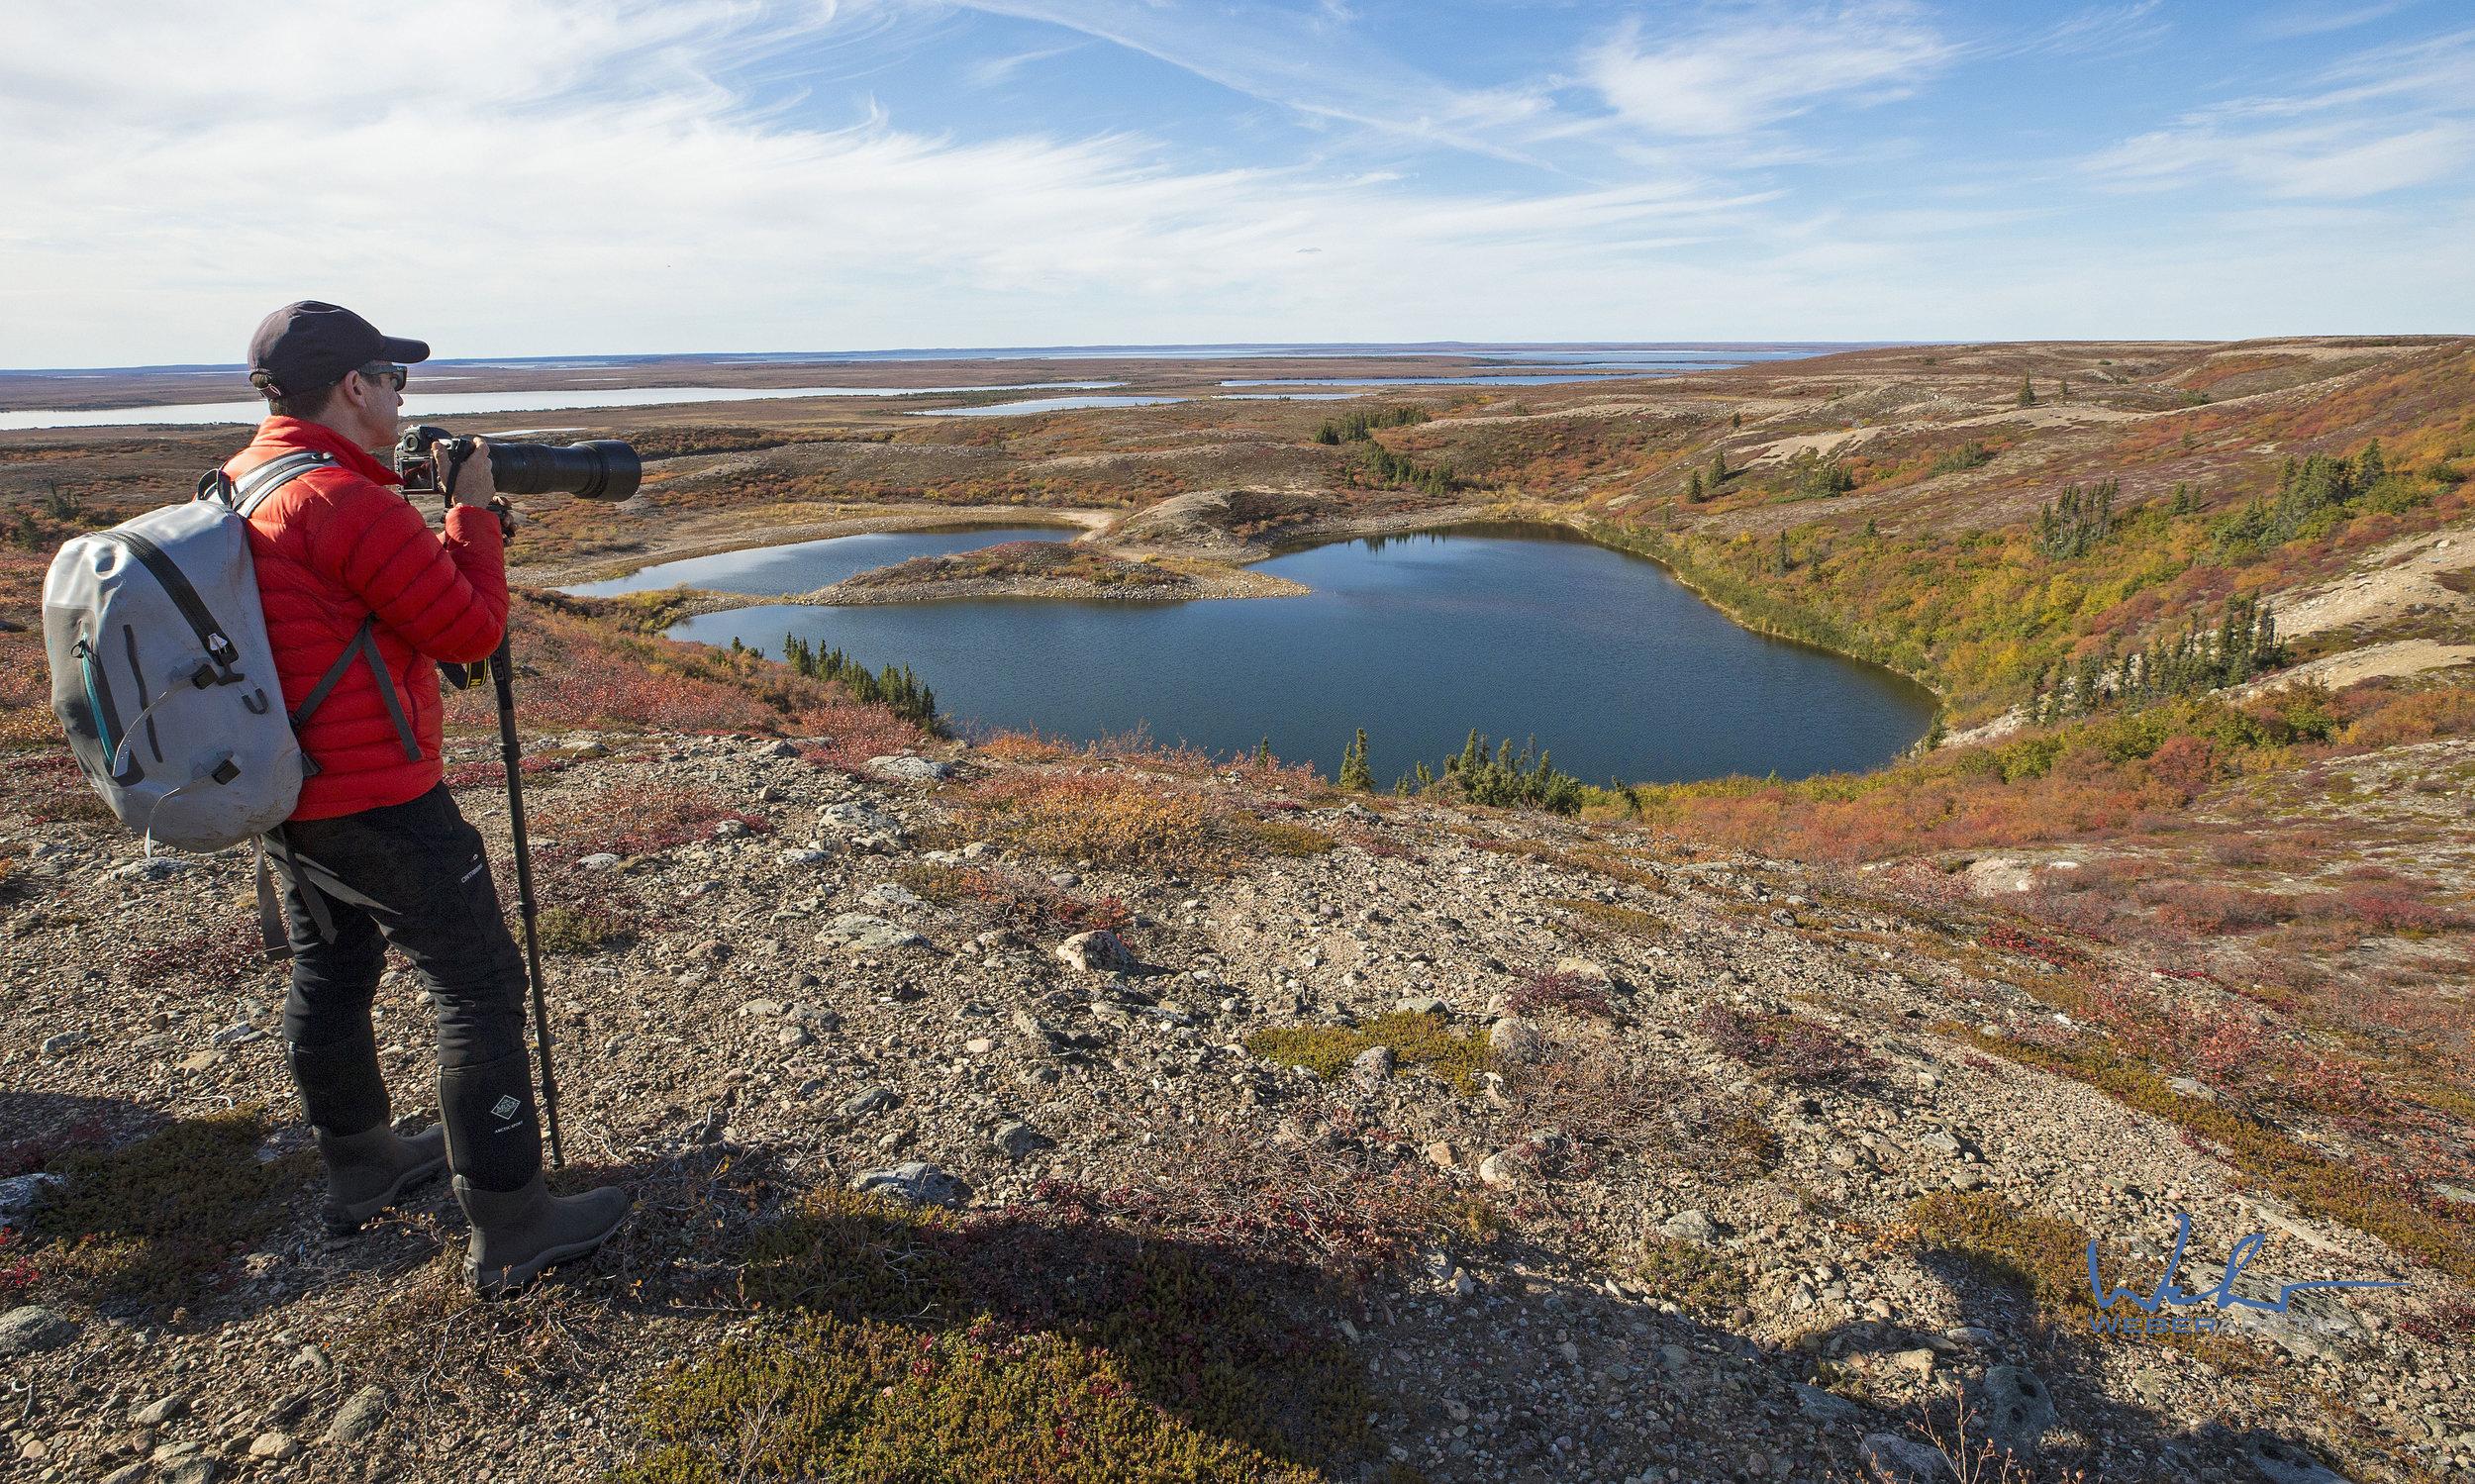 Autumn-tundra-landscapes-while-hiking-.jpg